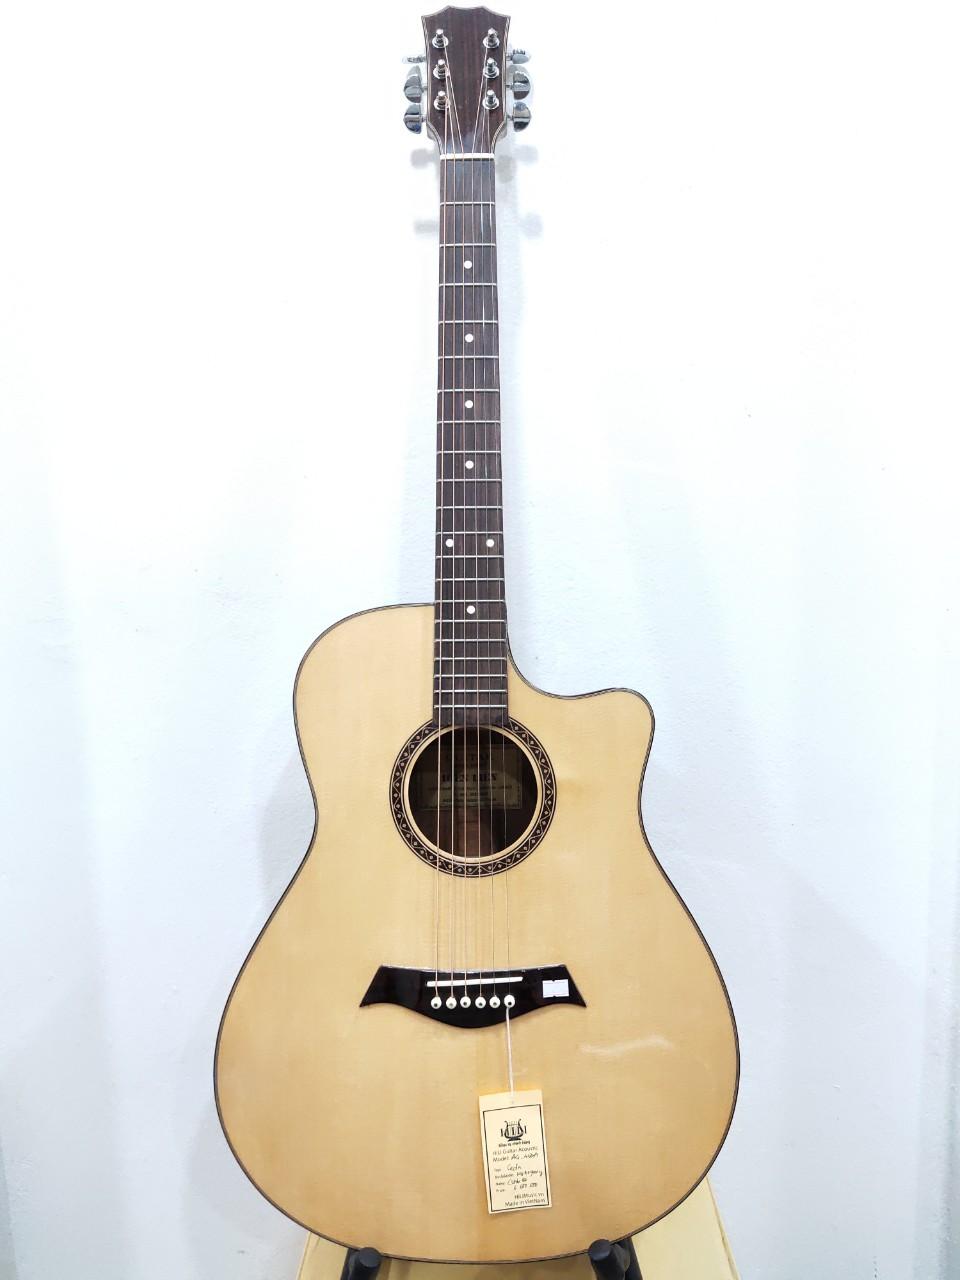 Đàn Guitar Acoustic AG-450A made in VietNam